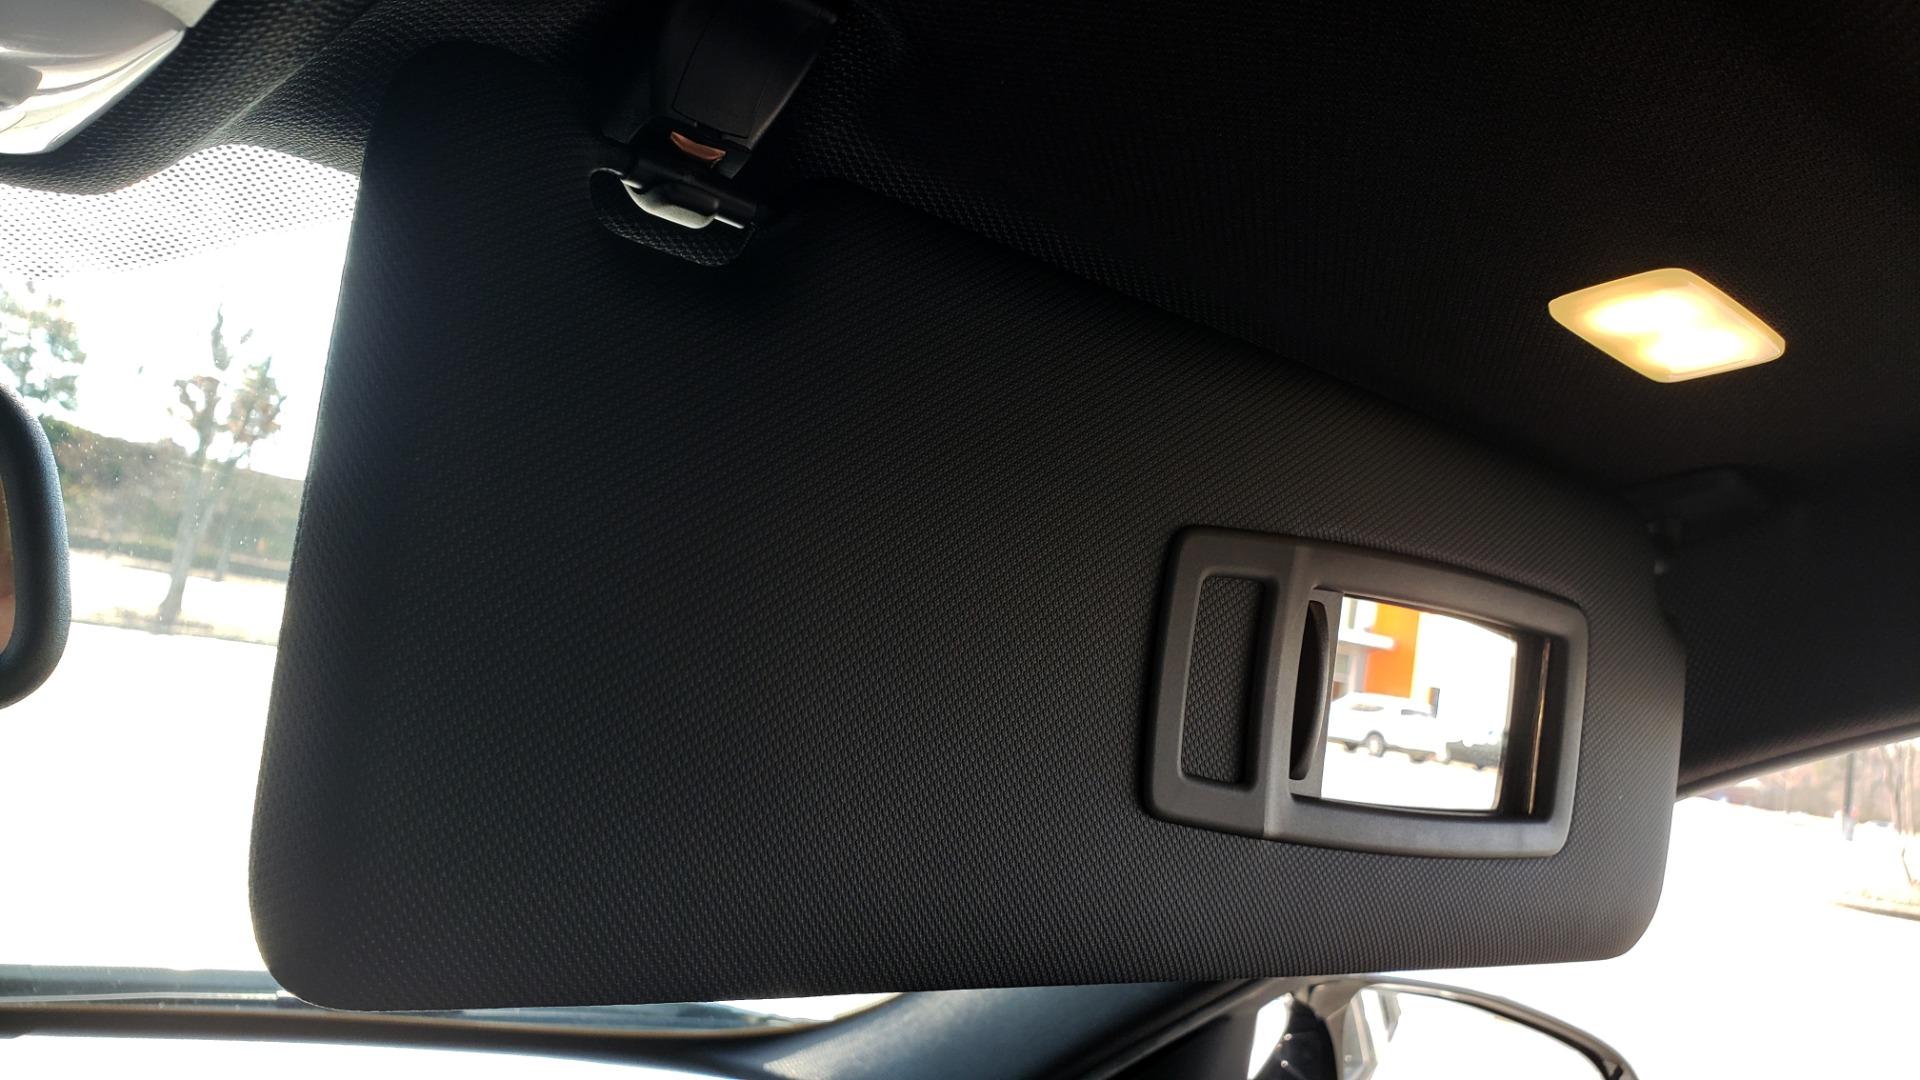 Used 2016 BMW M3 SEDAN / EXECUTIVE PKG / M-SUSPENSION / HARMAN/KARDON SOUND for sale Sold at Formula Imports in Charlotte NC 28227 61